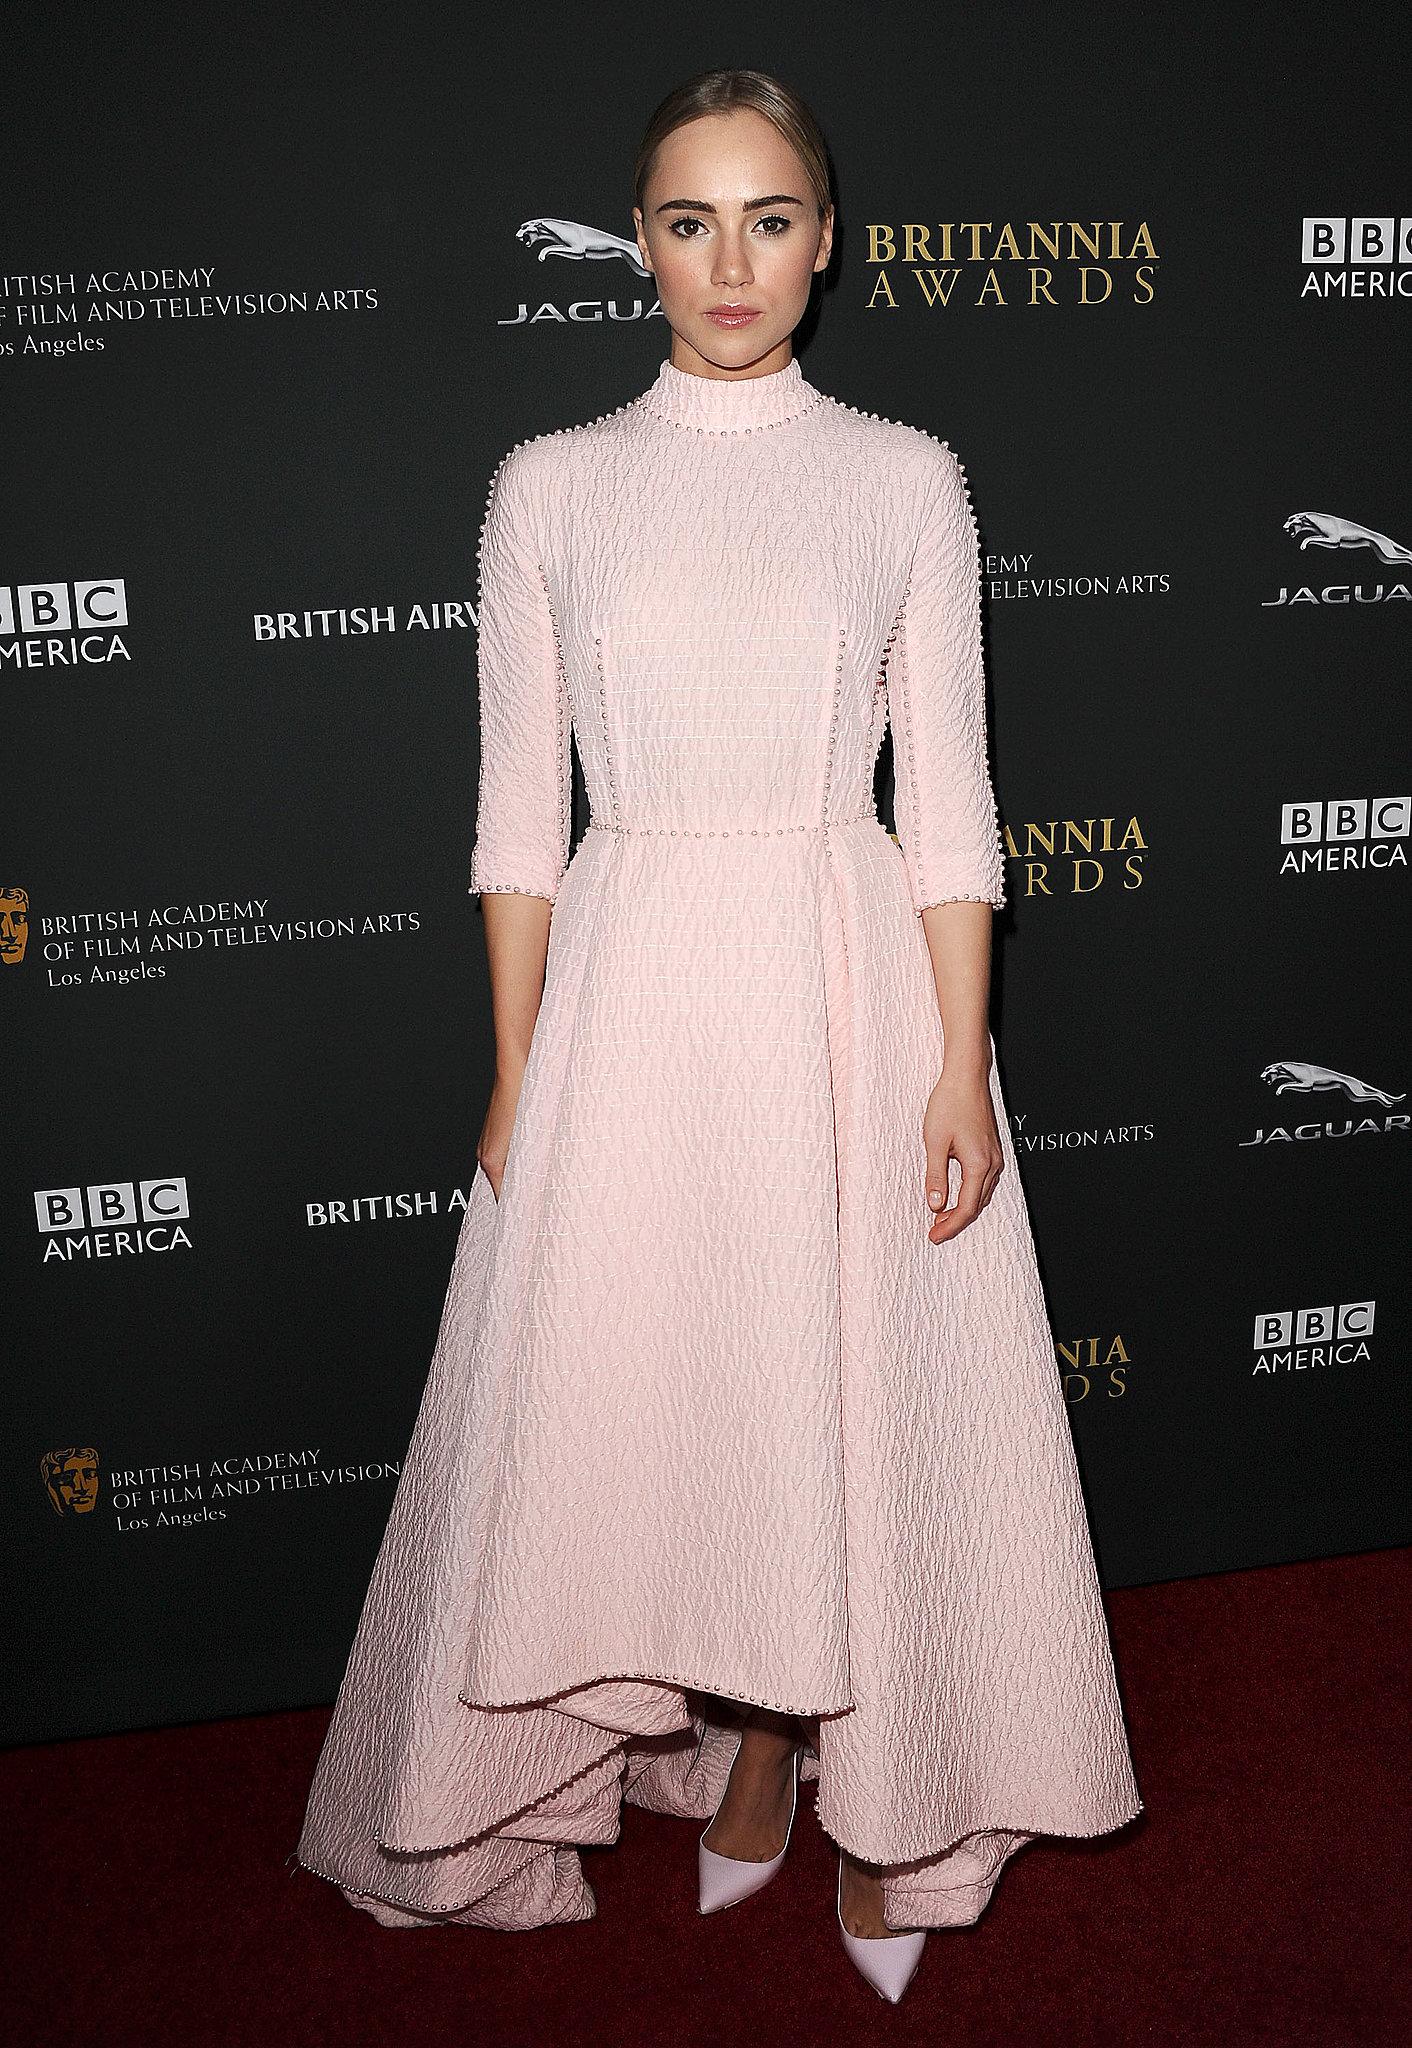 Suki Waterhouse at the BAFTA Britannia Awards.